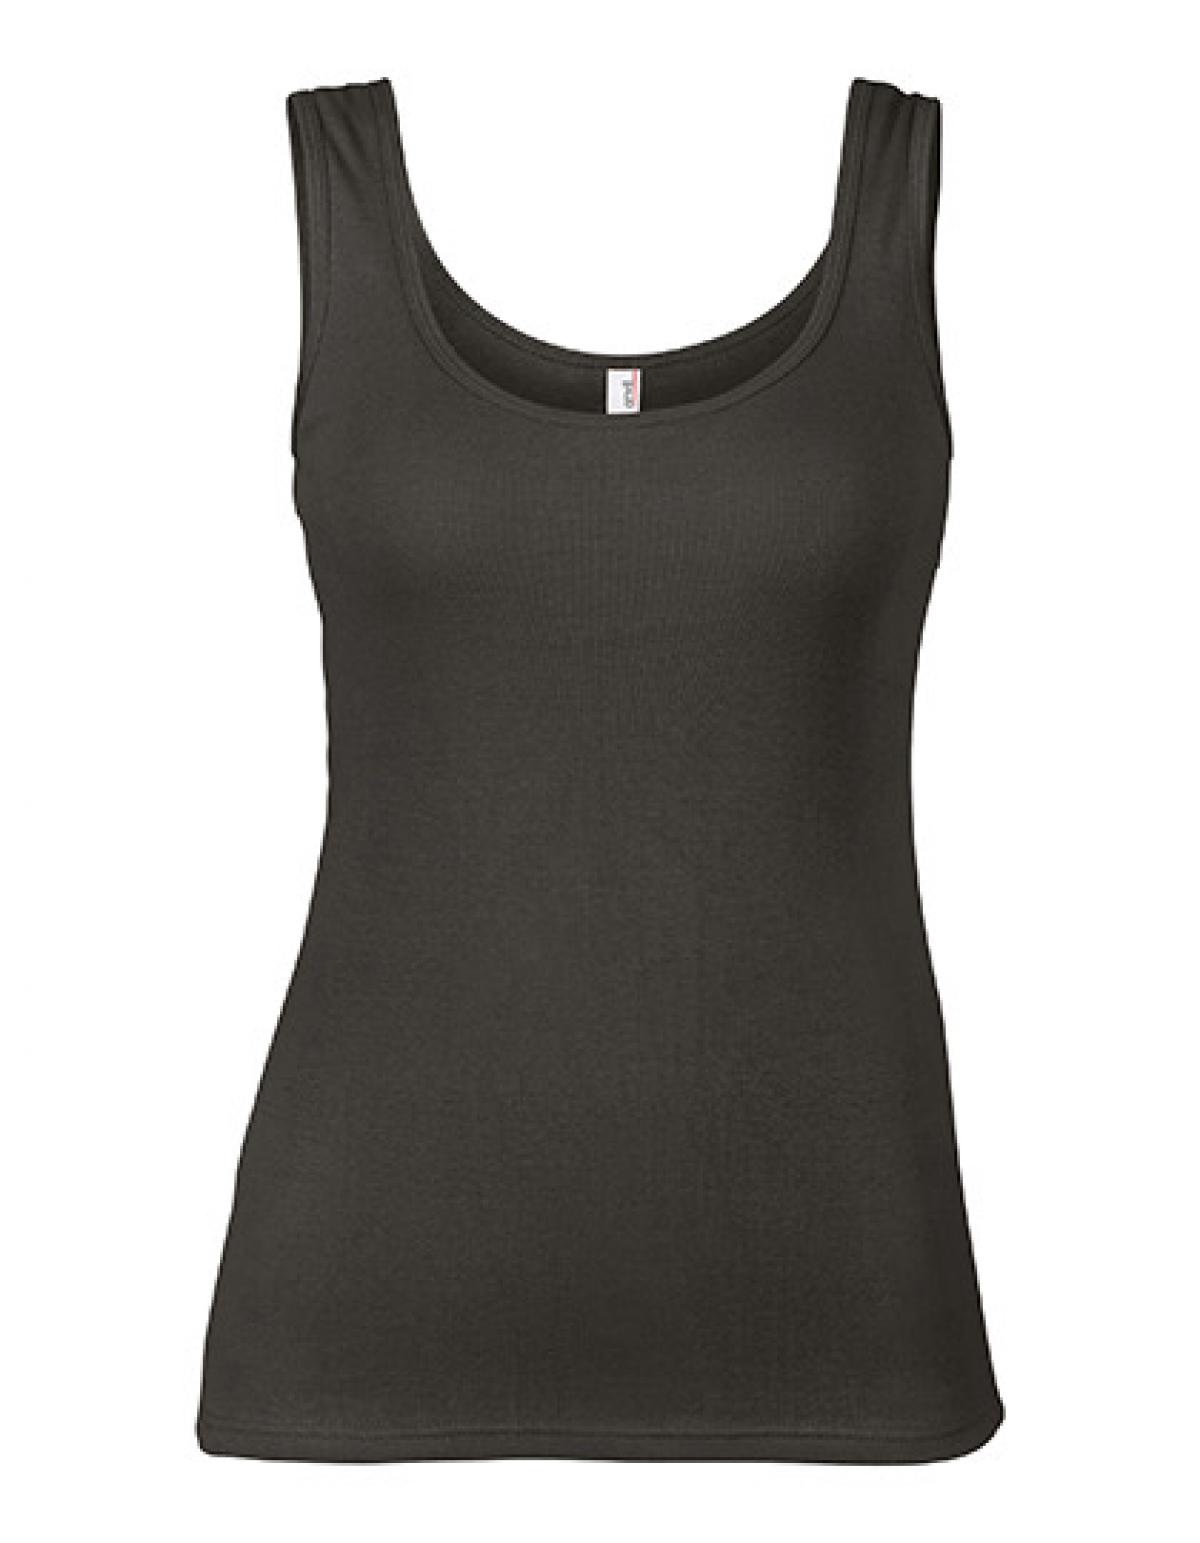 womens 1x1 baby rib tank top damen t shirt anvil ebay. Black Bedroom Furniture Sets. Home Design Ideas